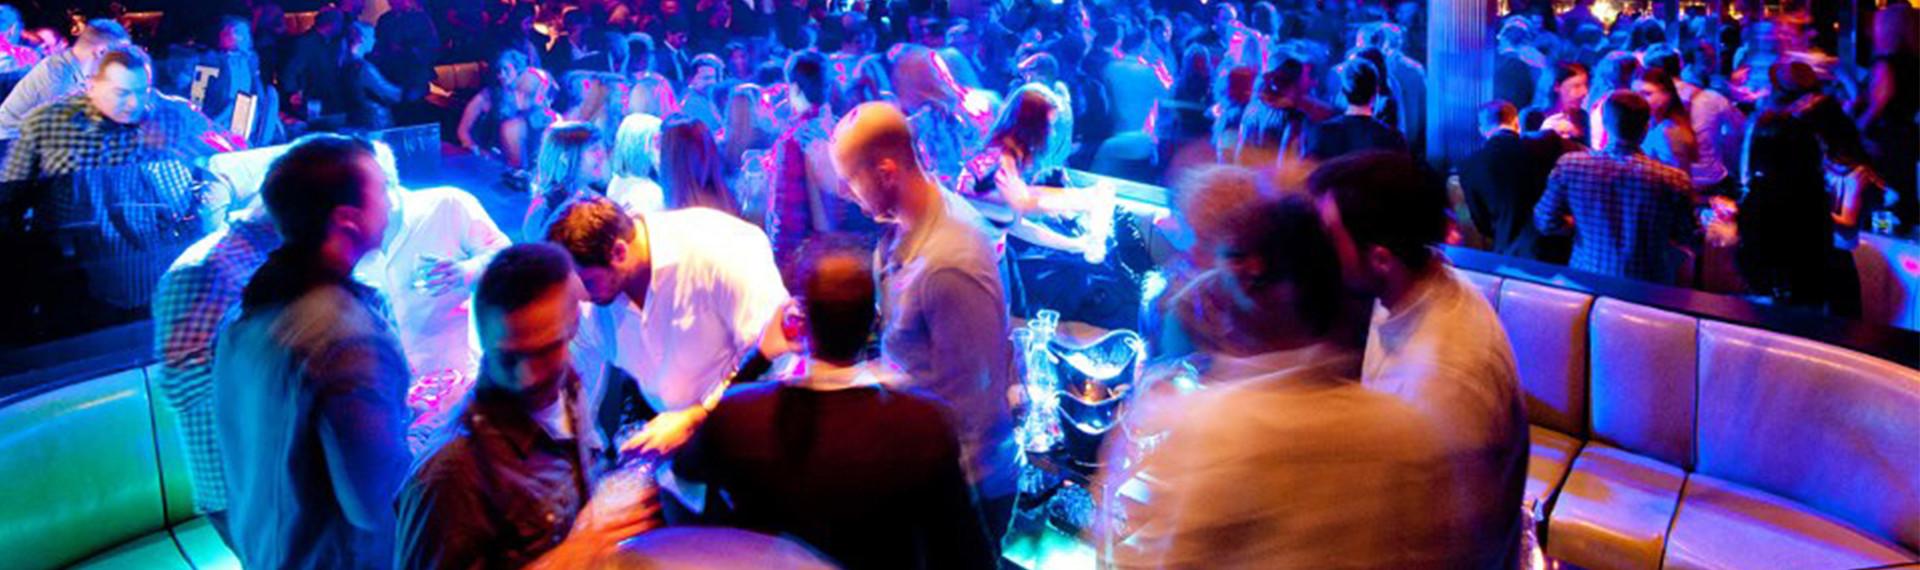 Nightclub VIP Table